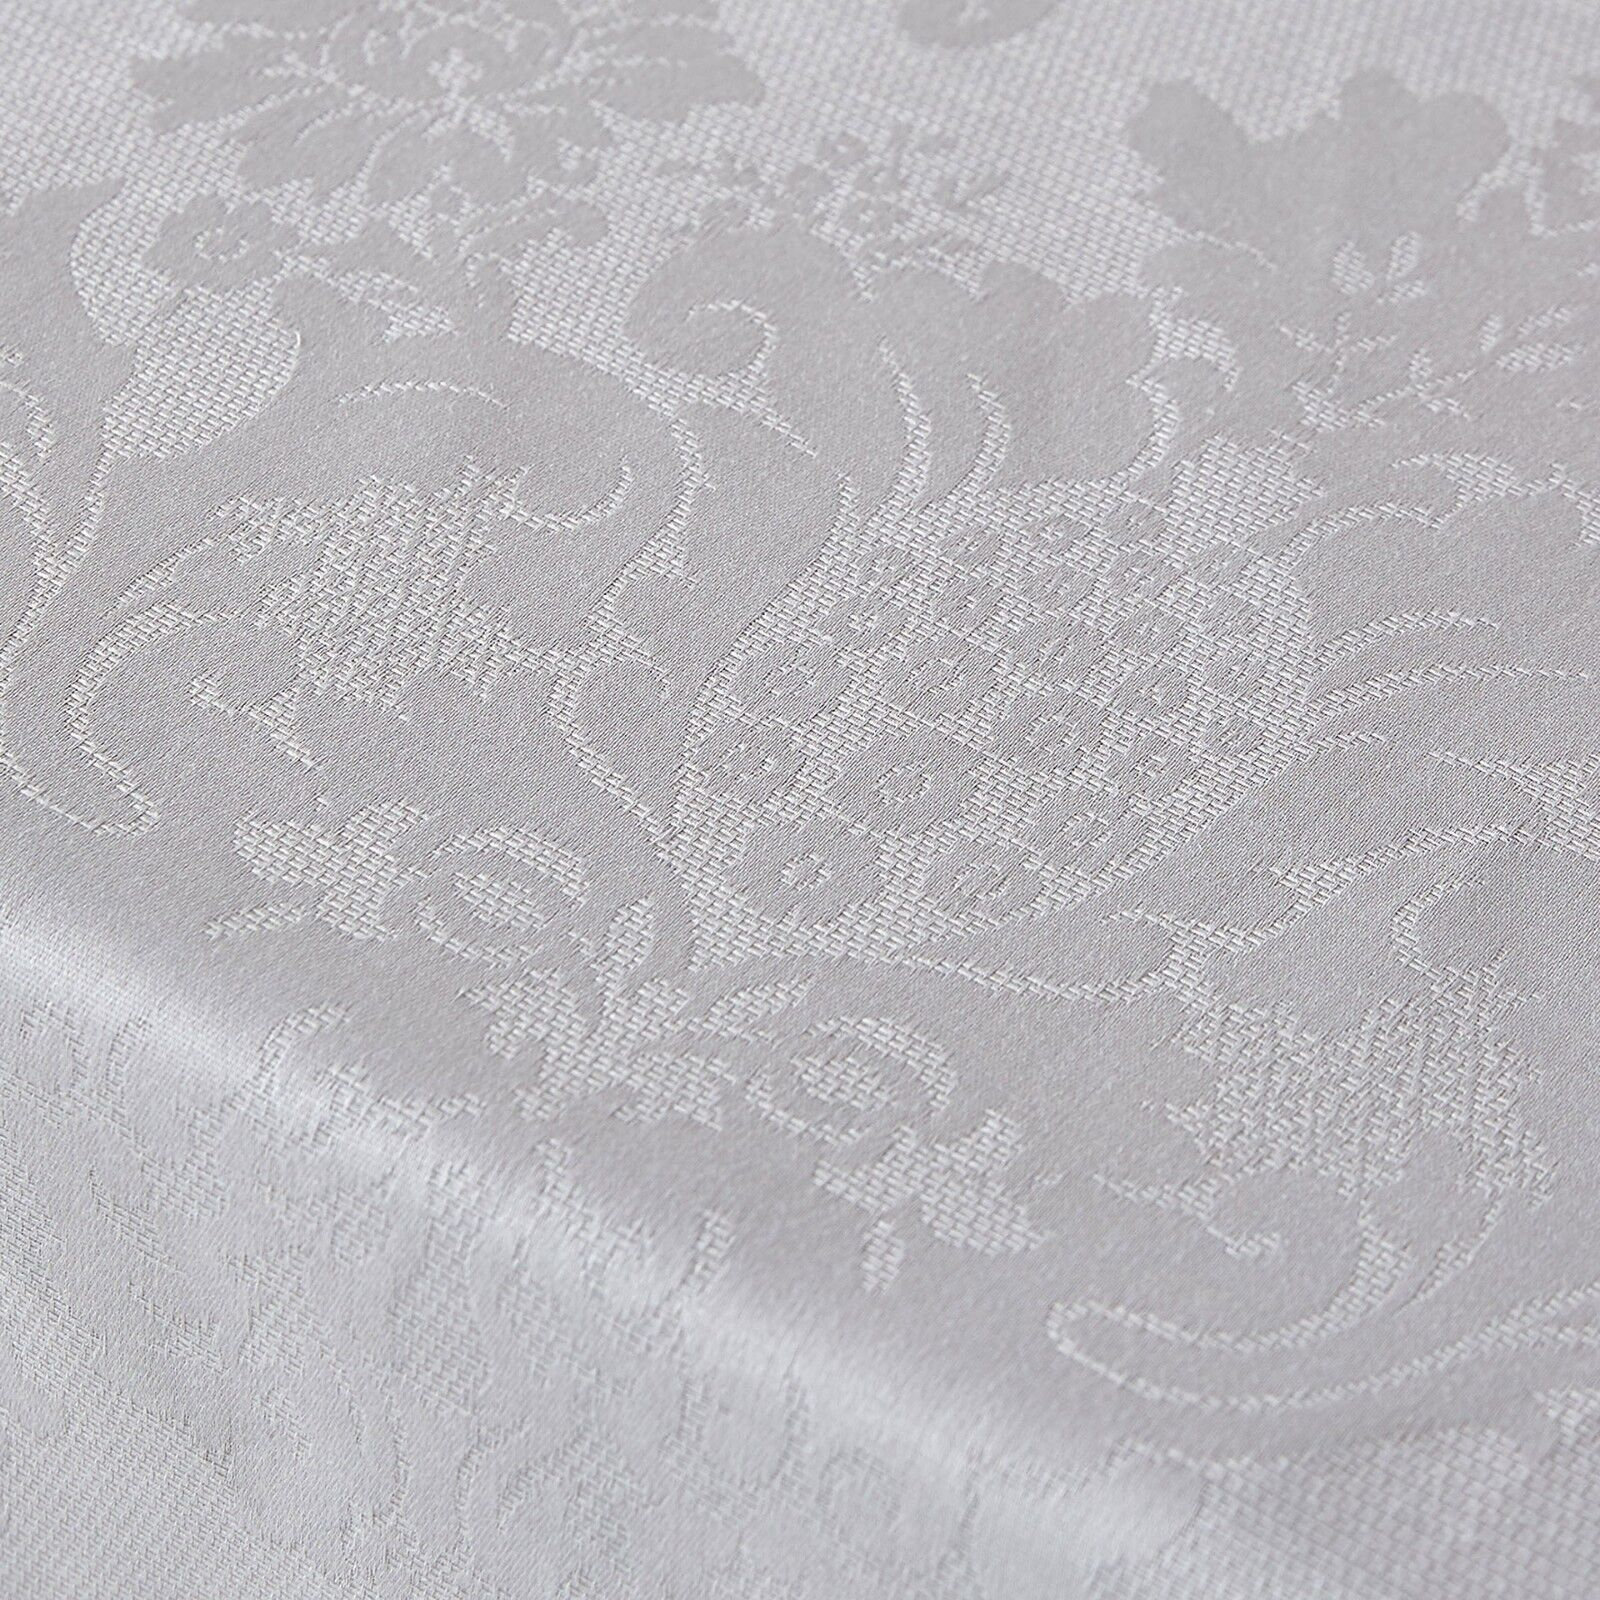 Jacquard Print White 4 Pc Sheet Set All Sizes 1200 Thread Count 100% Pure Cotton